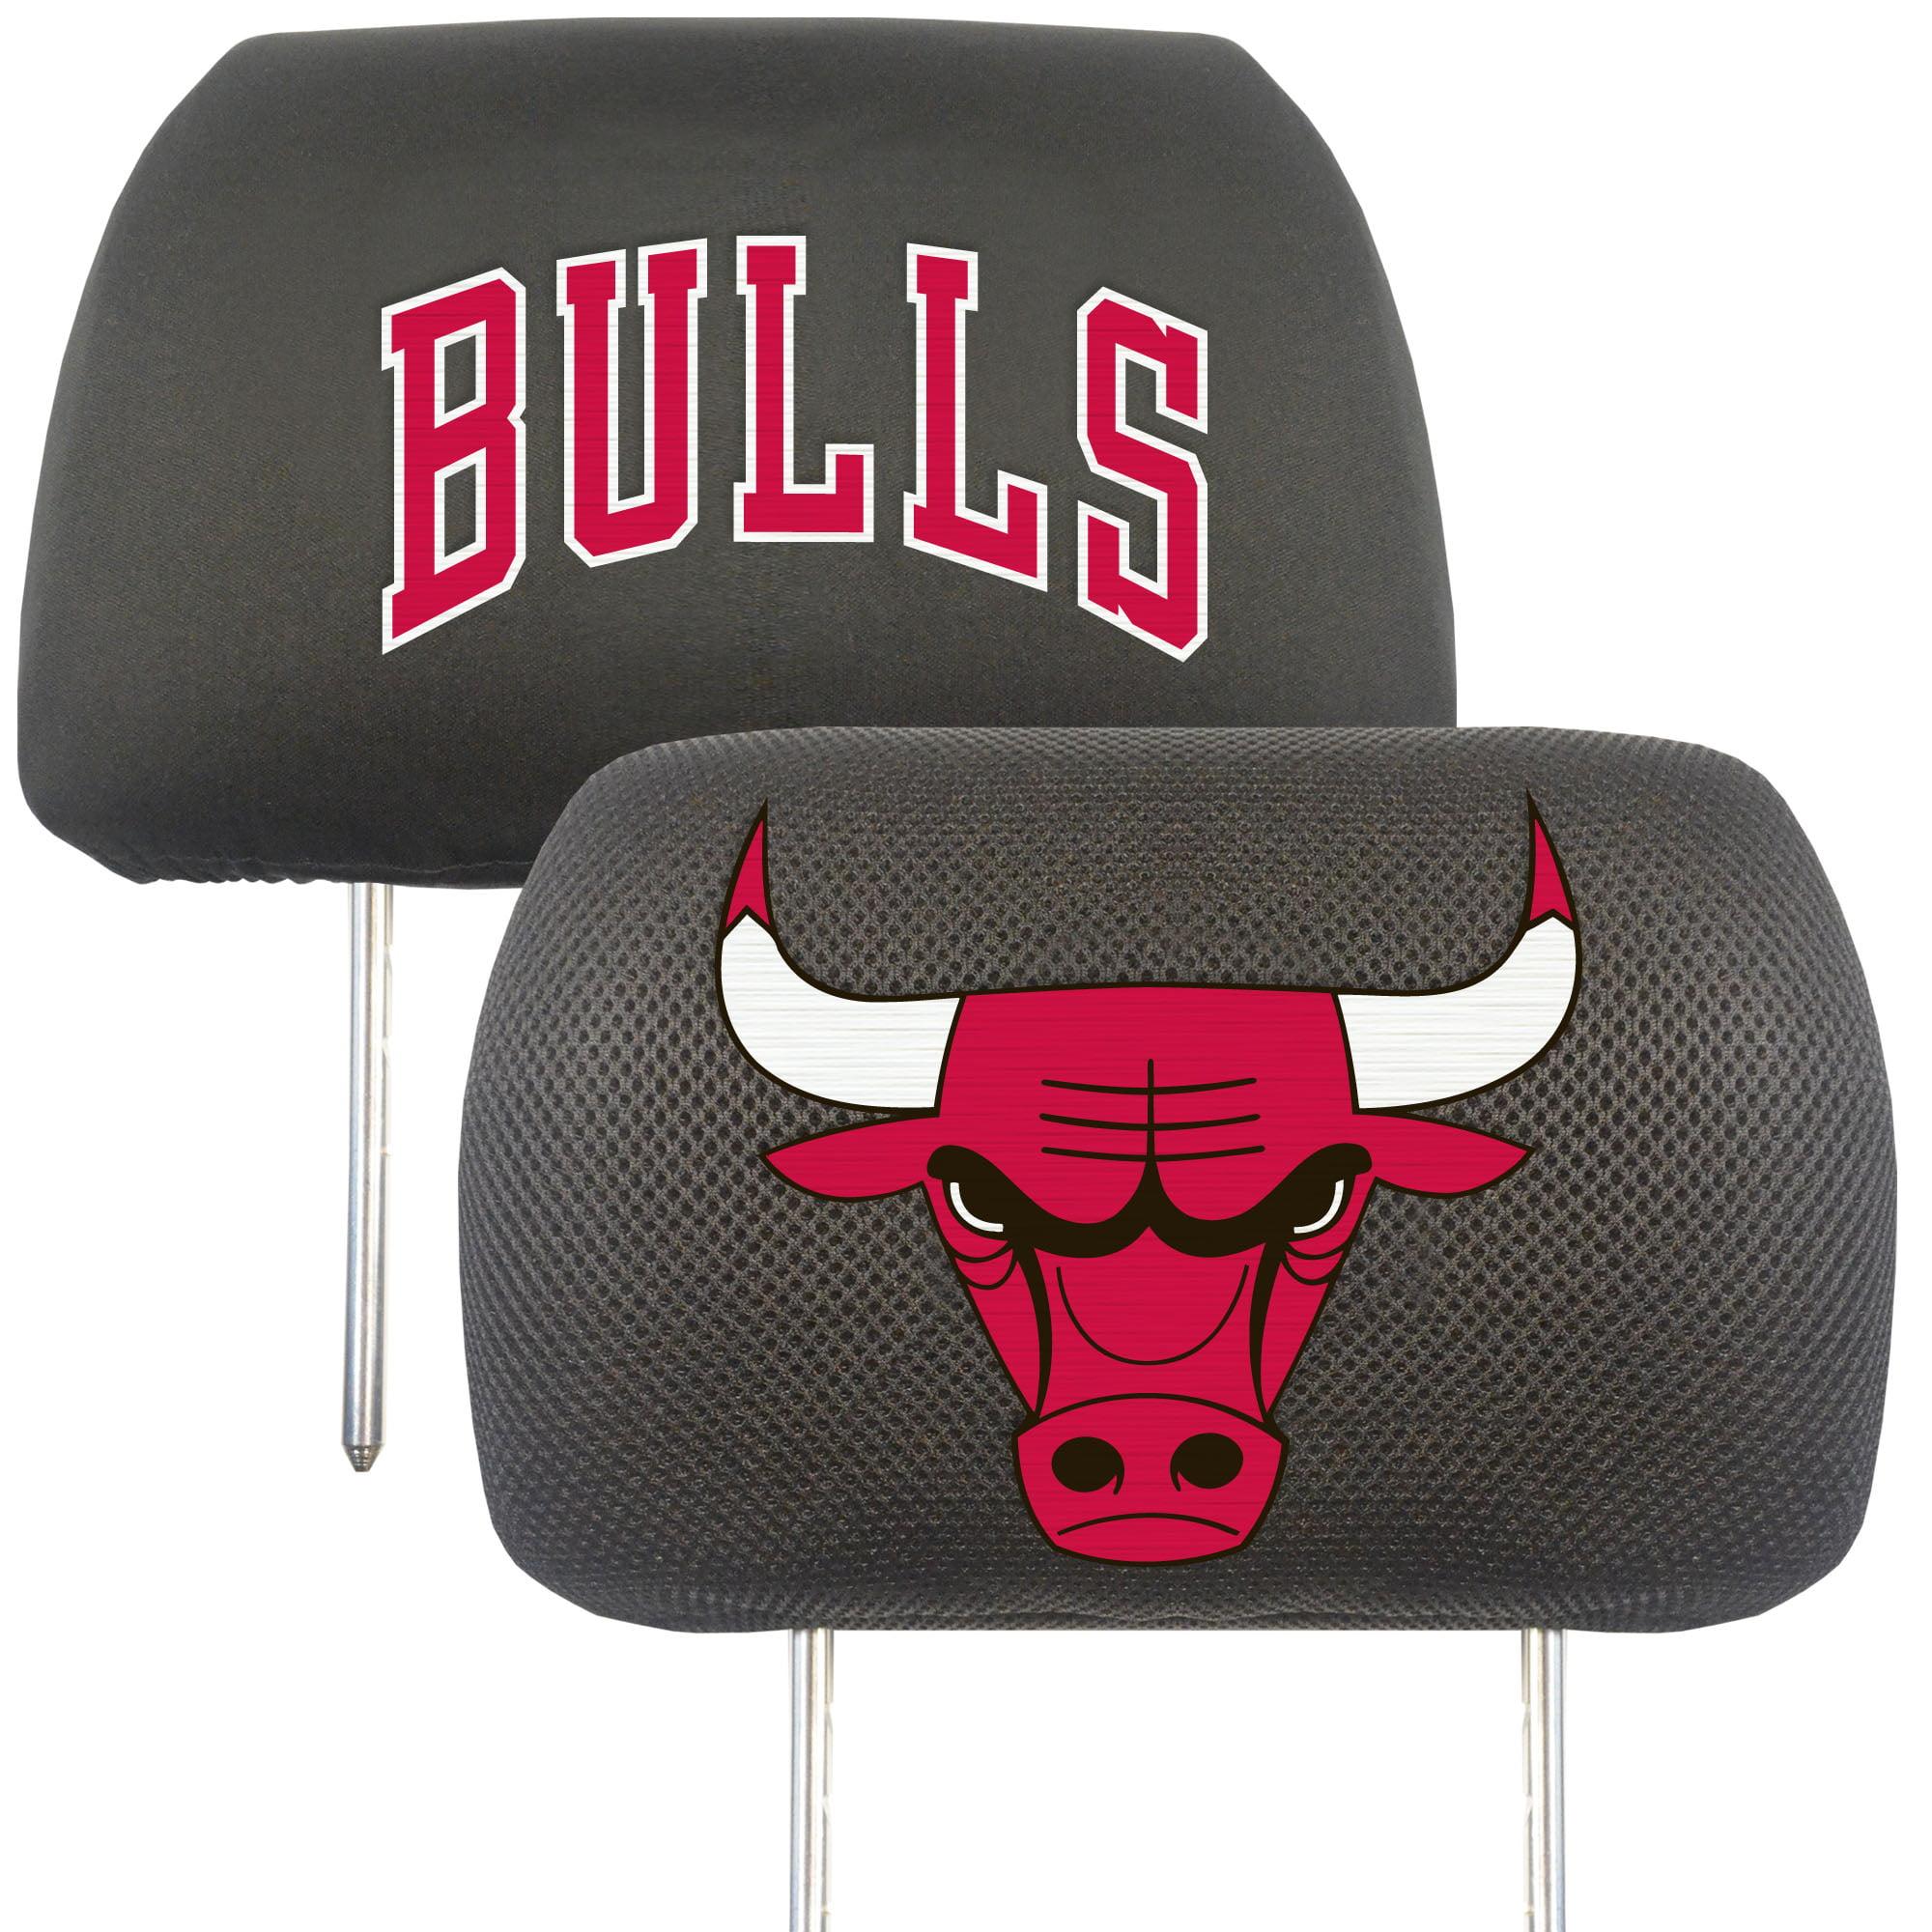 NBA Chicago Bulls Head Rest Cover Automotive Accessory